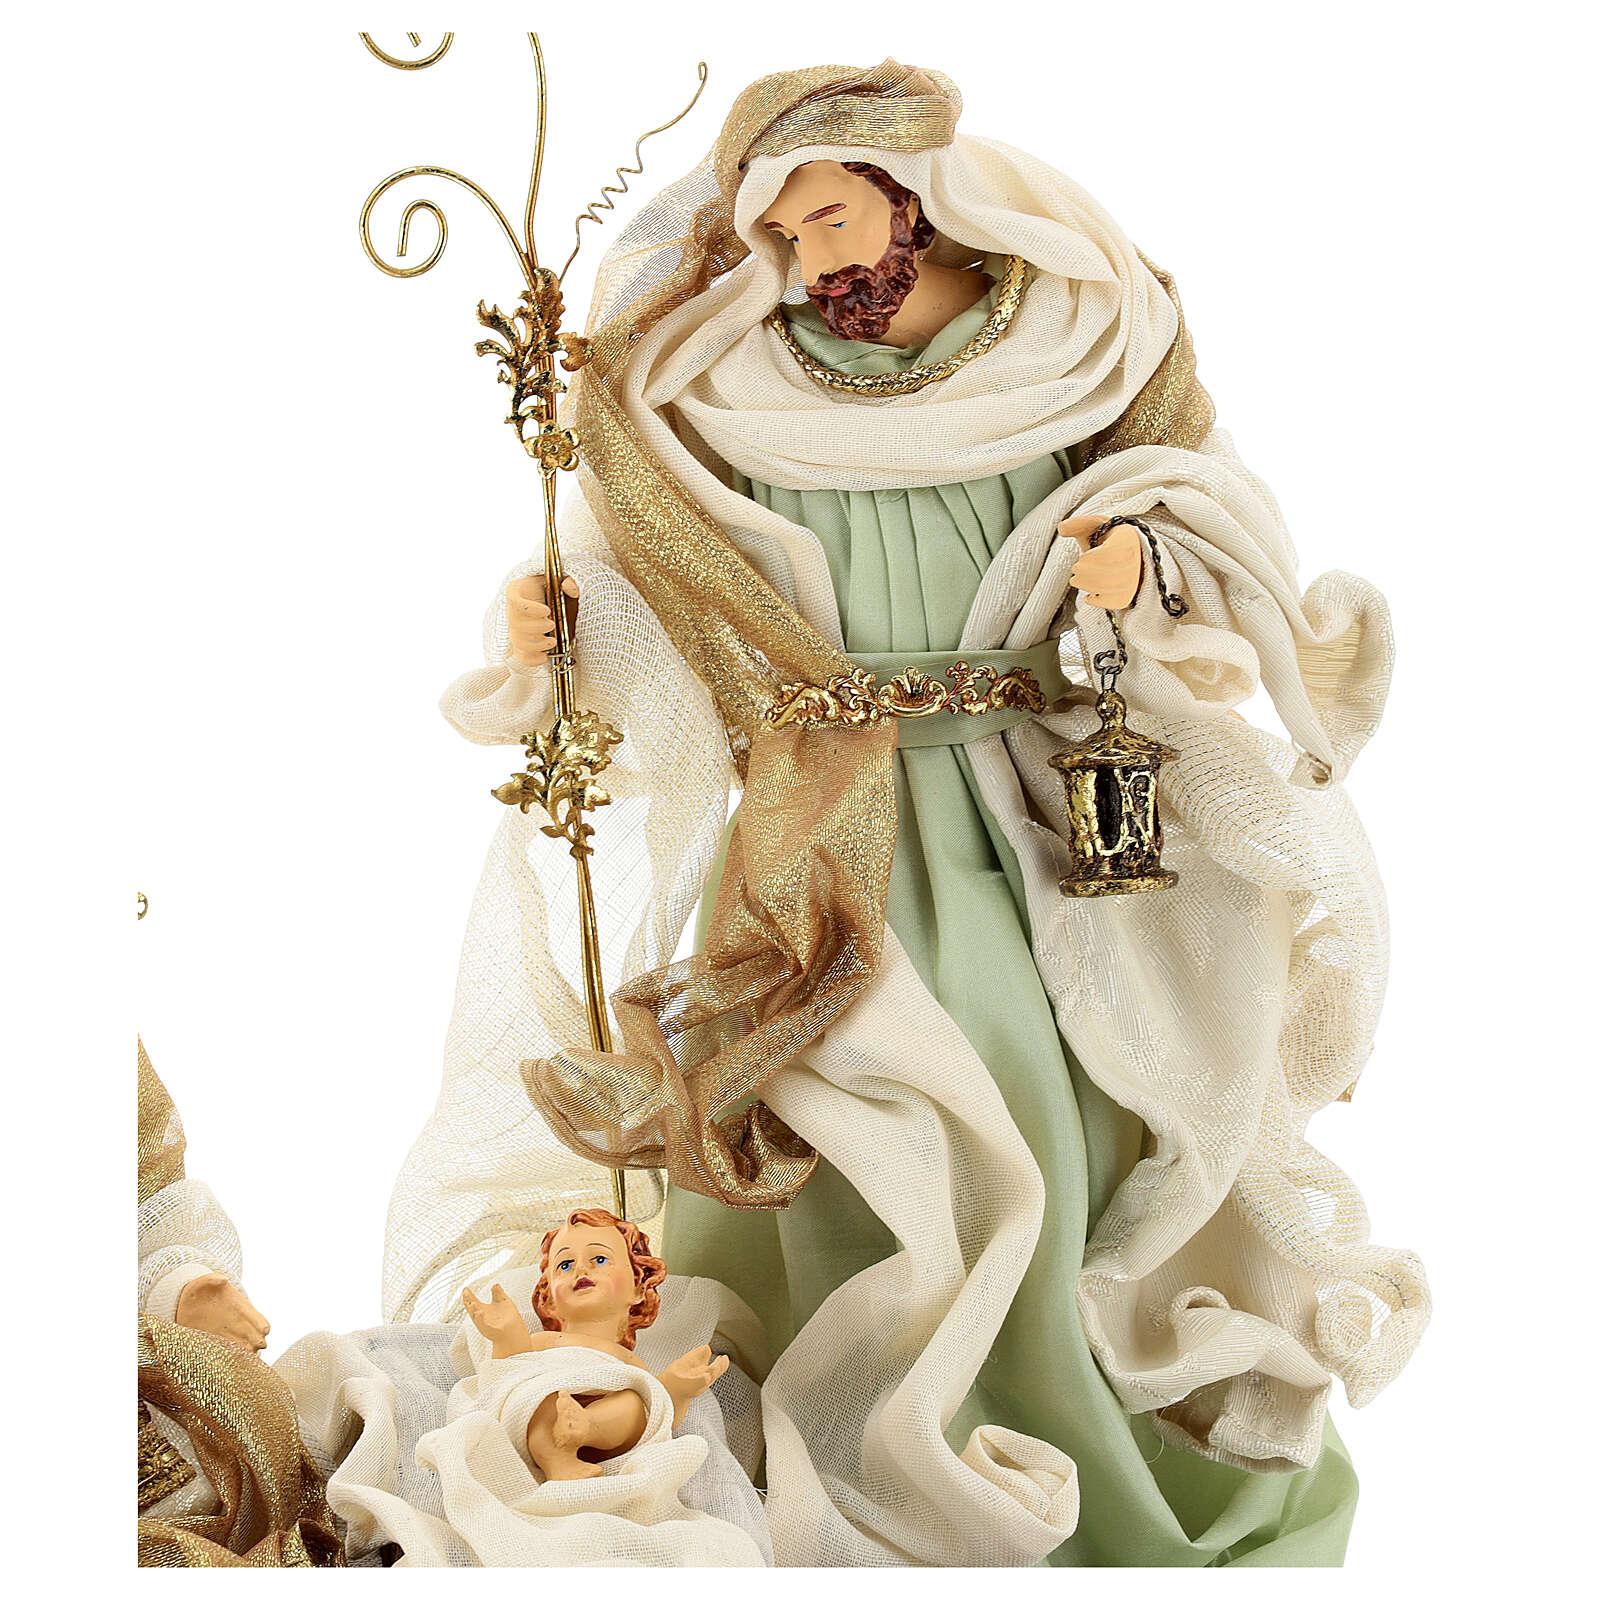 Sacra famiglia resina stoffa stile veneziano 40 cm  3